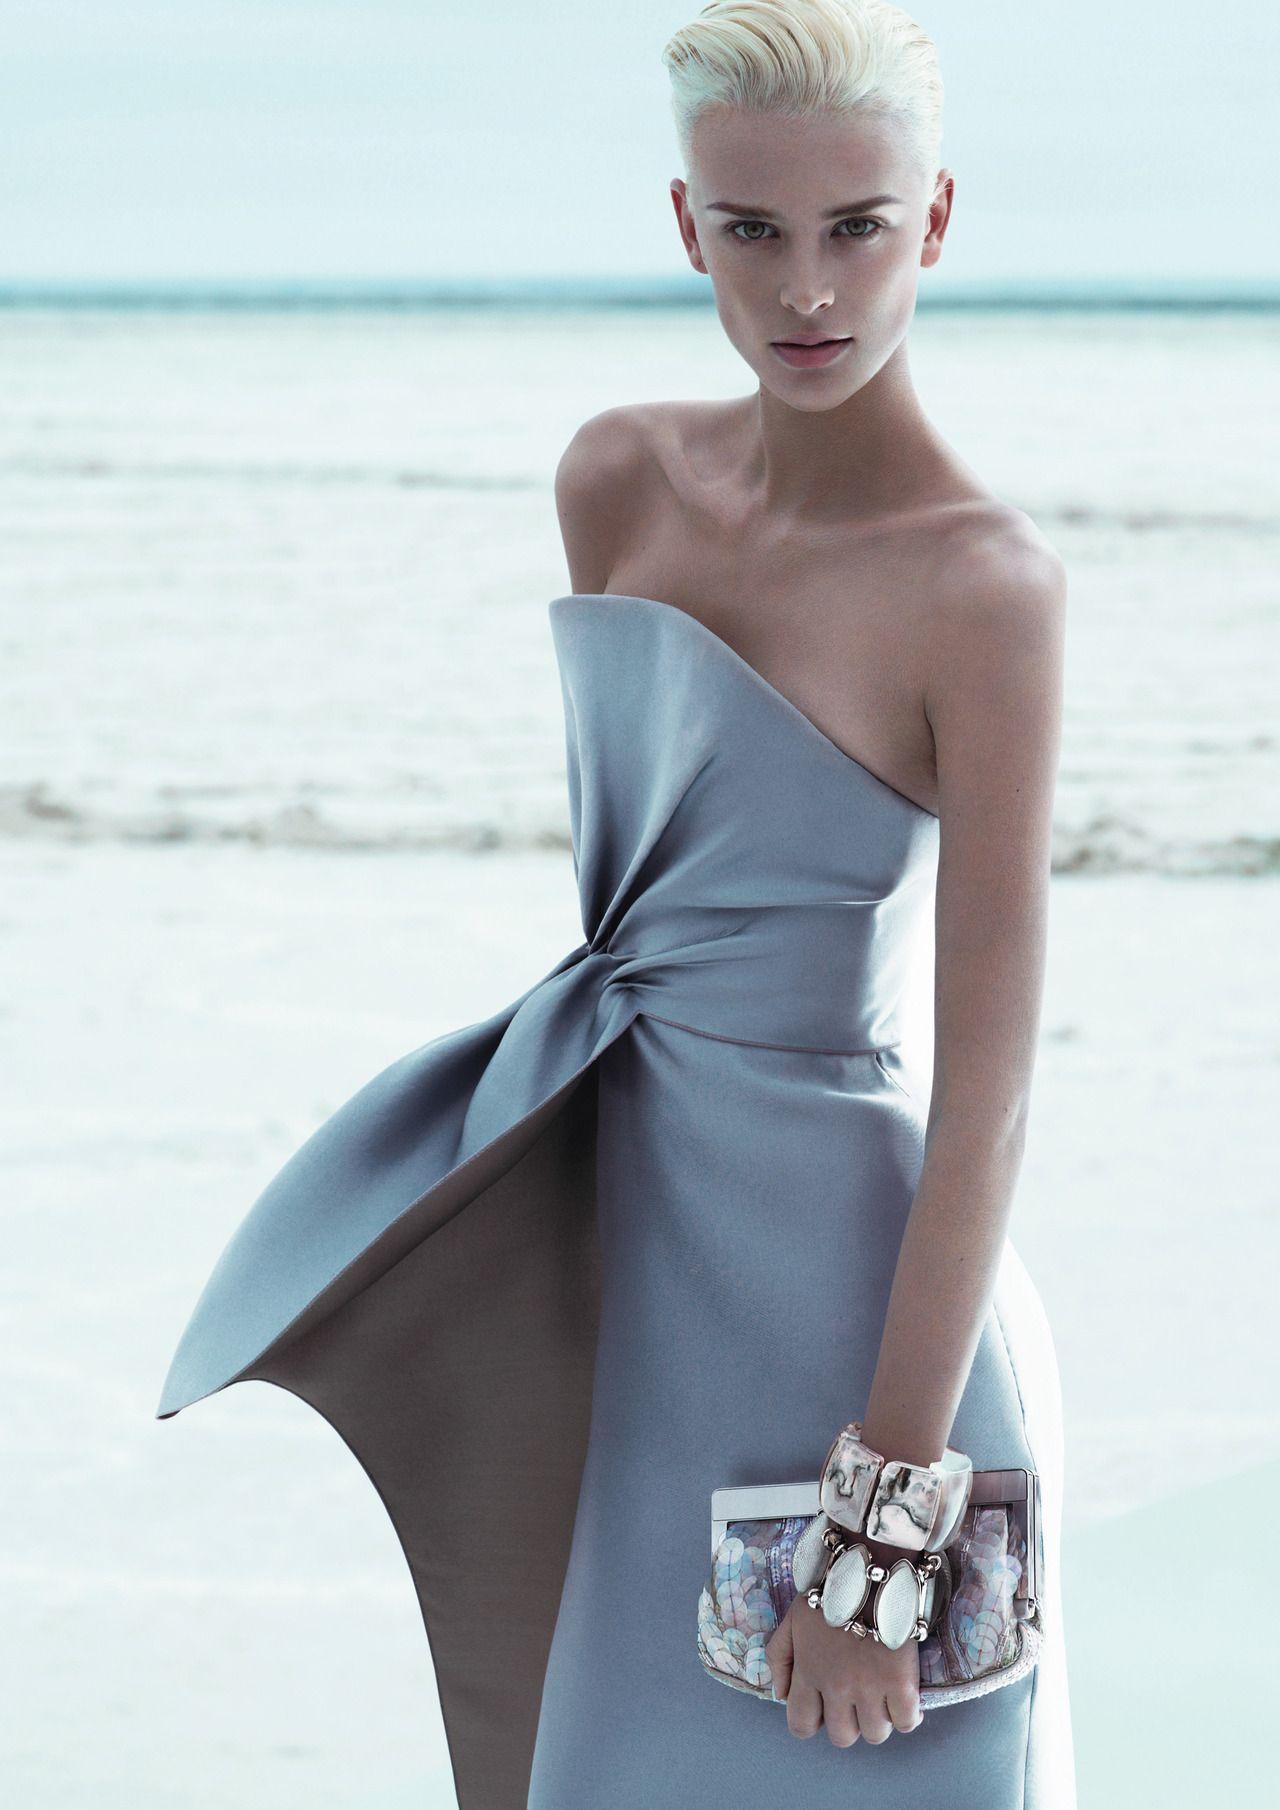 Giorgio Armani. This dress is divine!